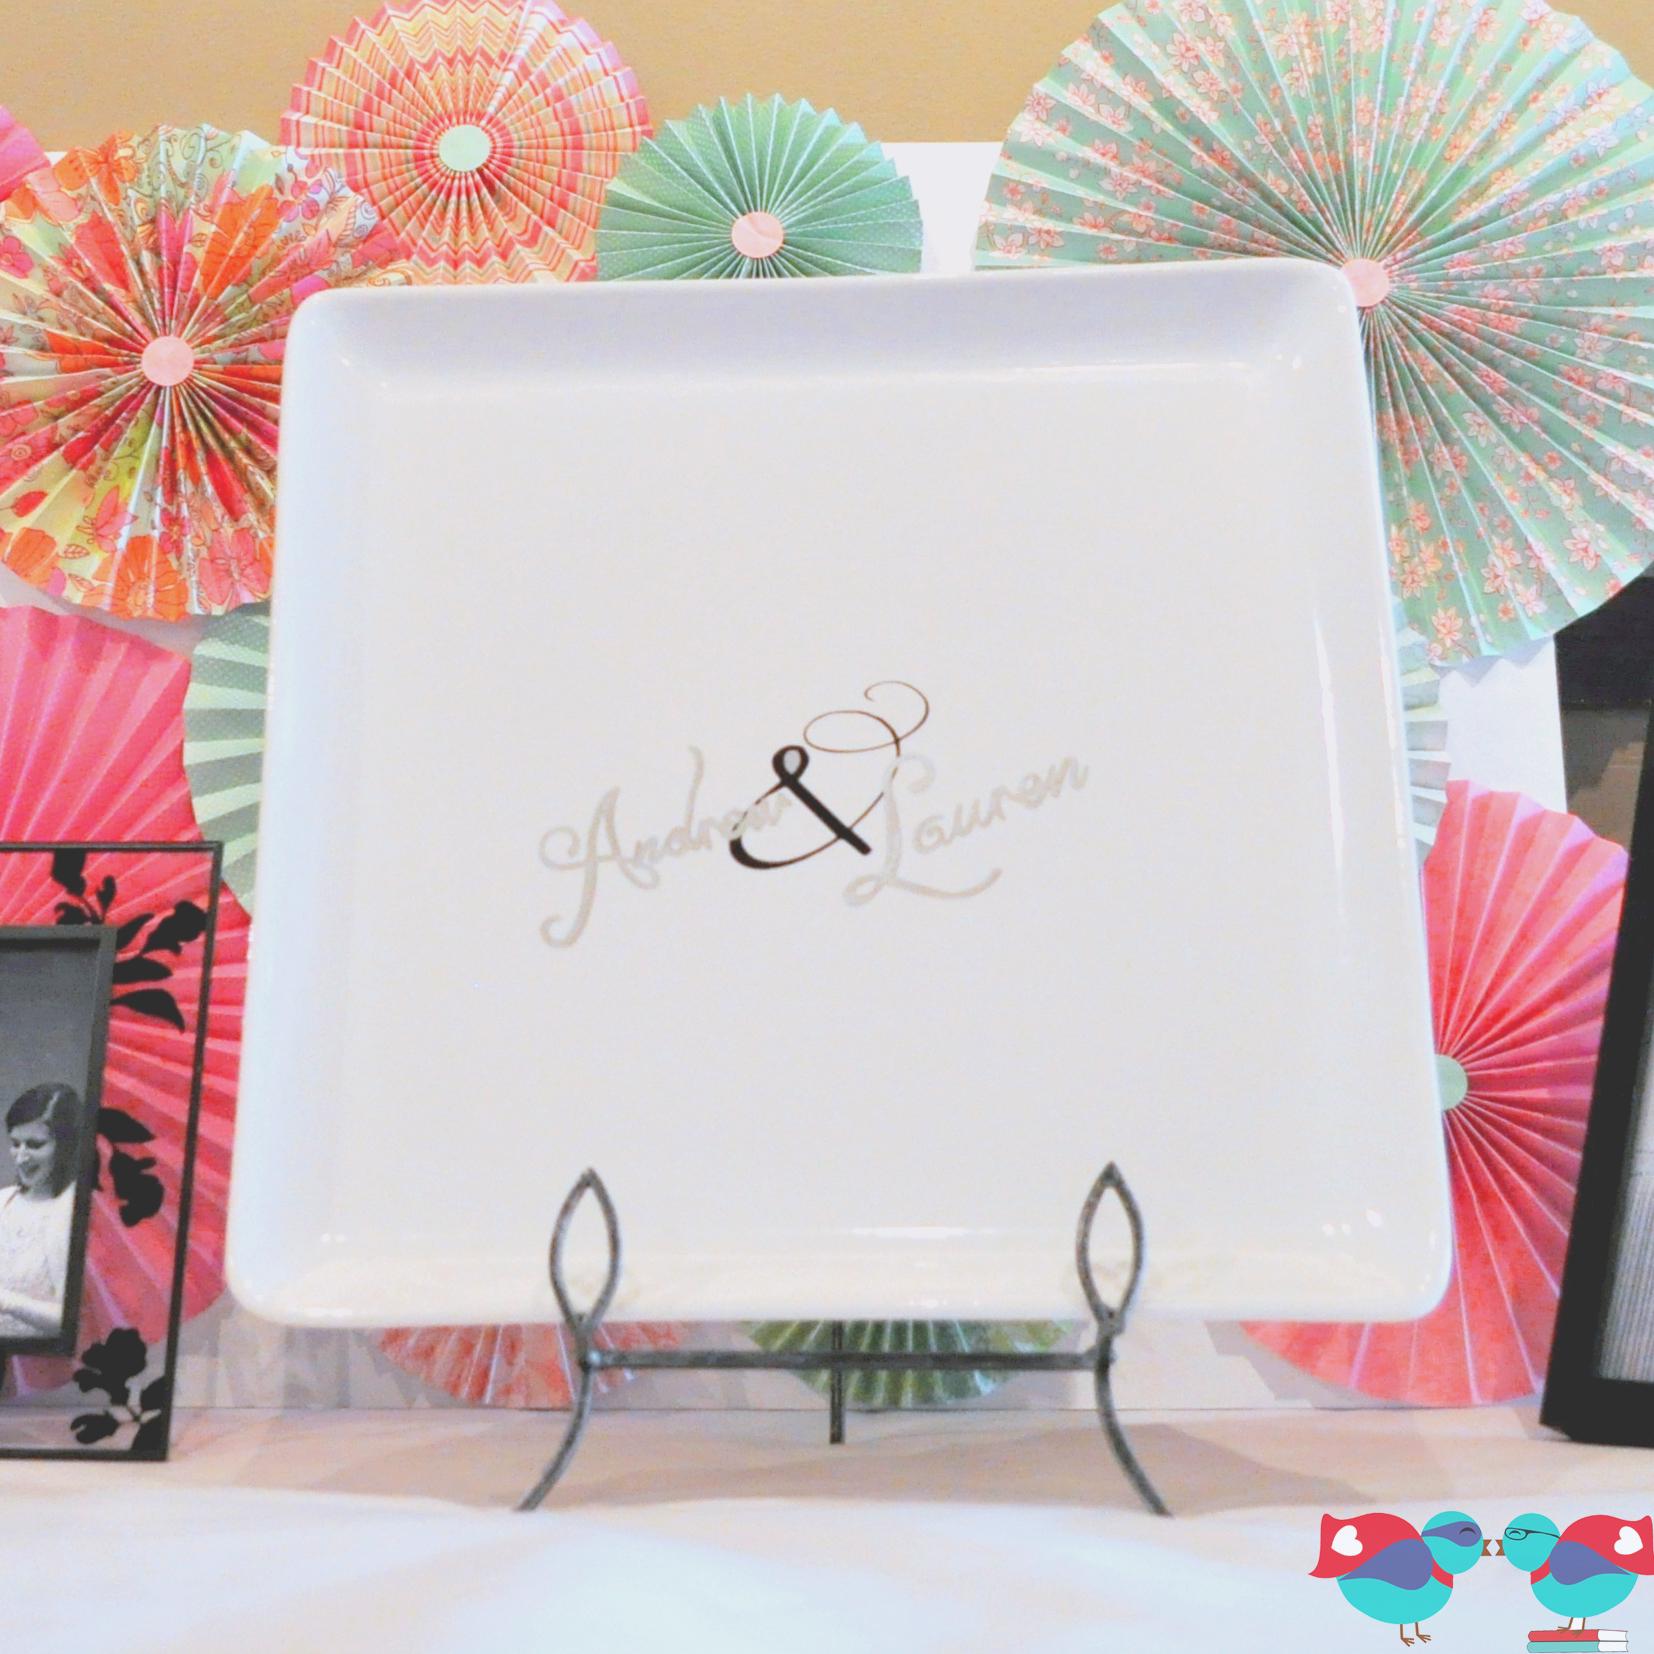 DIY Wedding Guest Book Plate via The Love Nerds